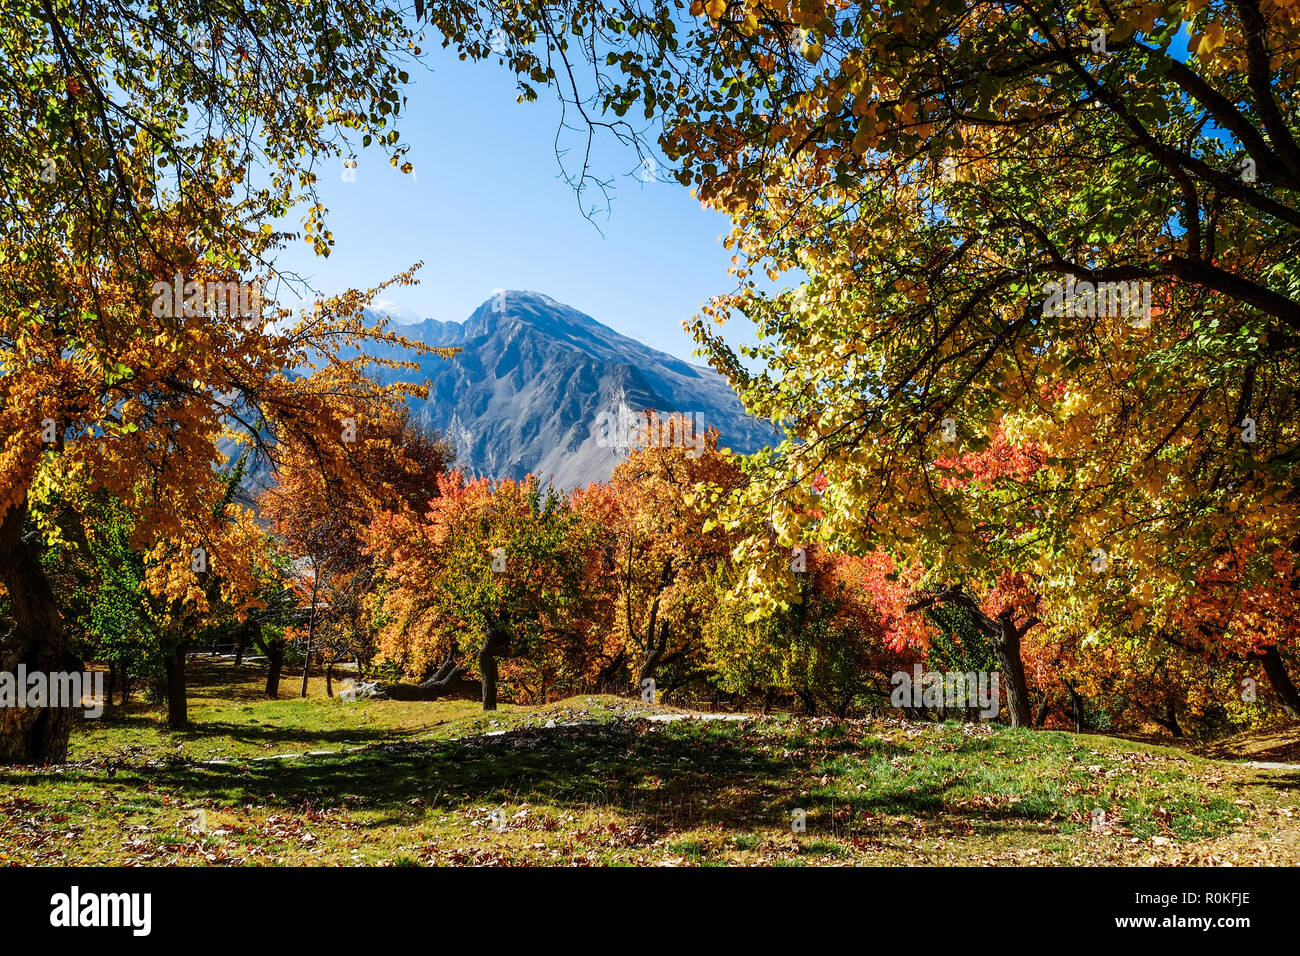 Colorful trees in autumn, Altit royal garden, Gilgit-Baltistan, Pakistan. - Stock Image